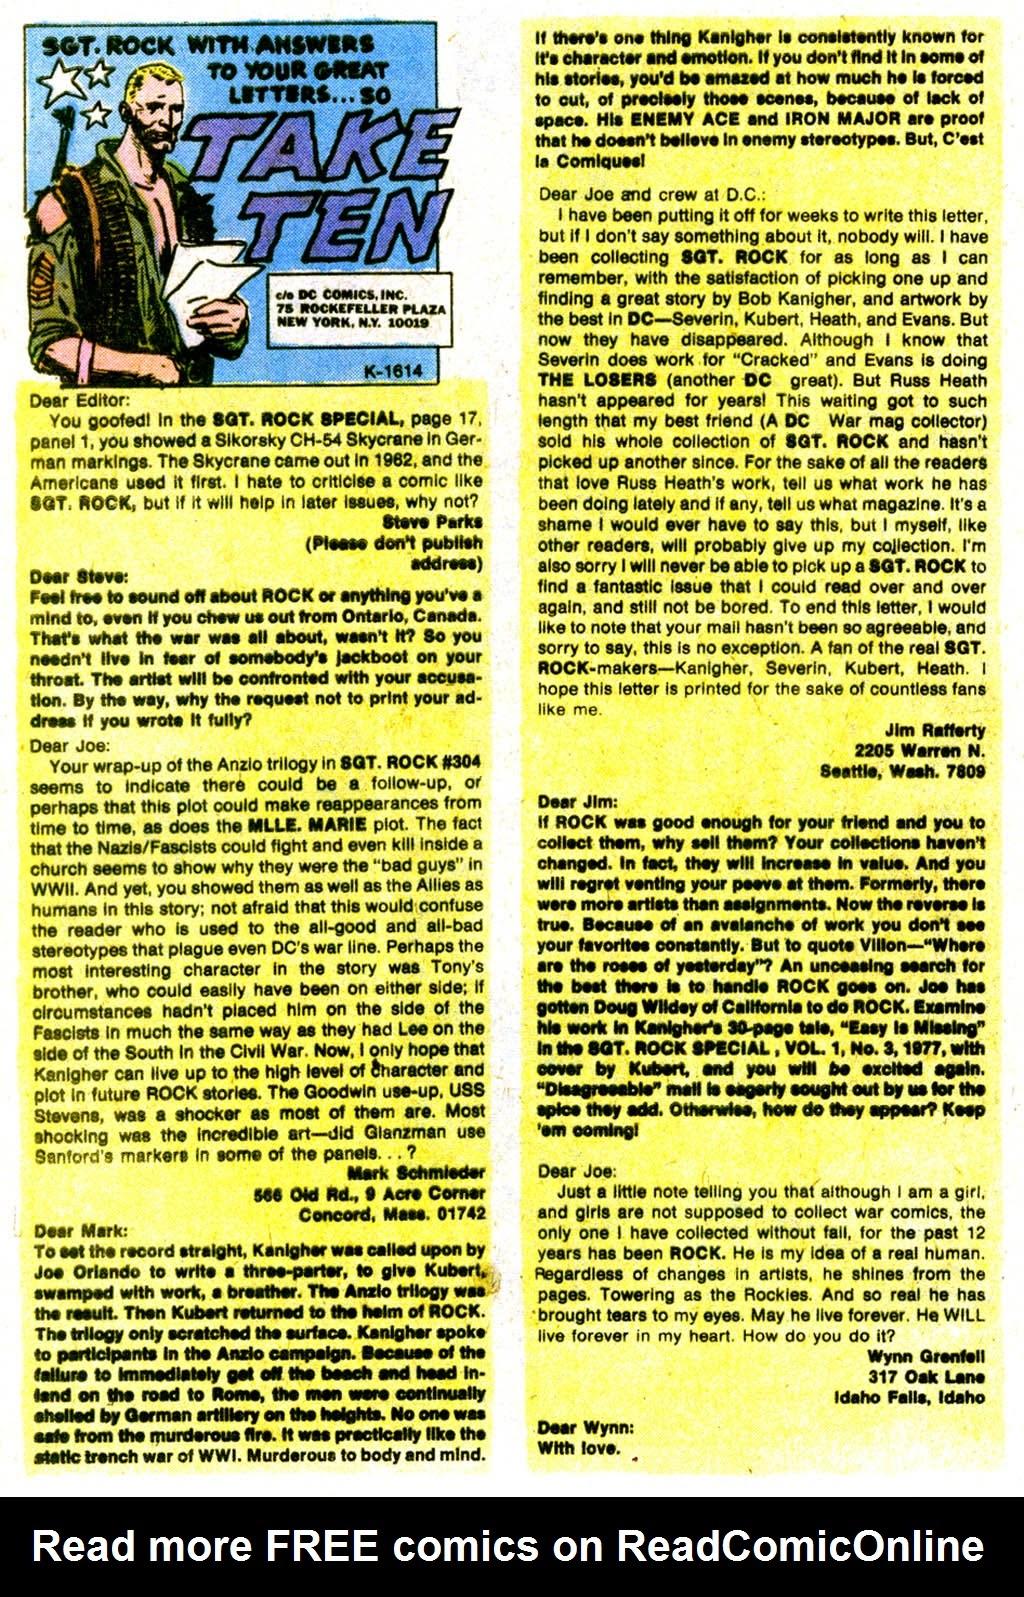 Read online Sgt. Rock comic -  Issue #317 - 27